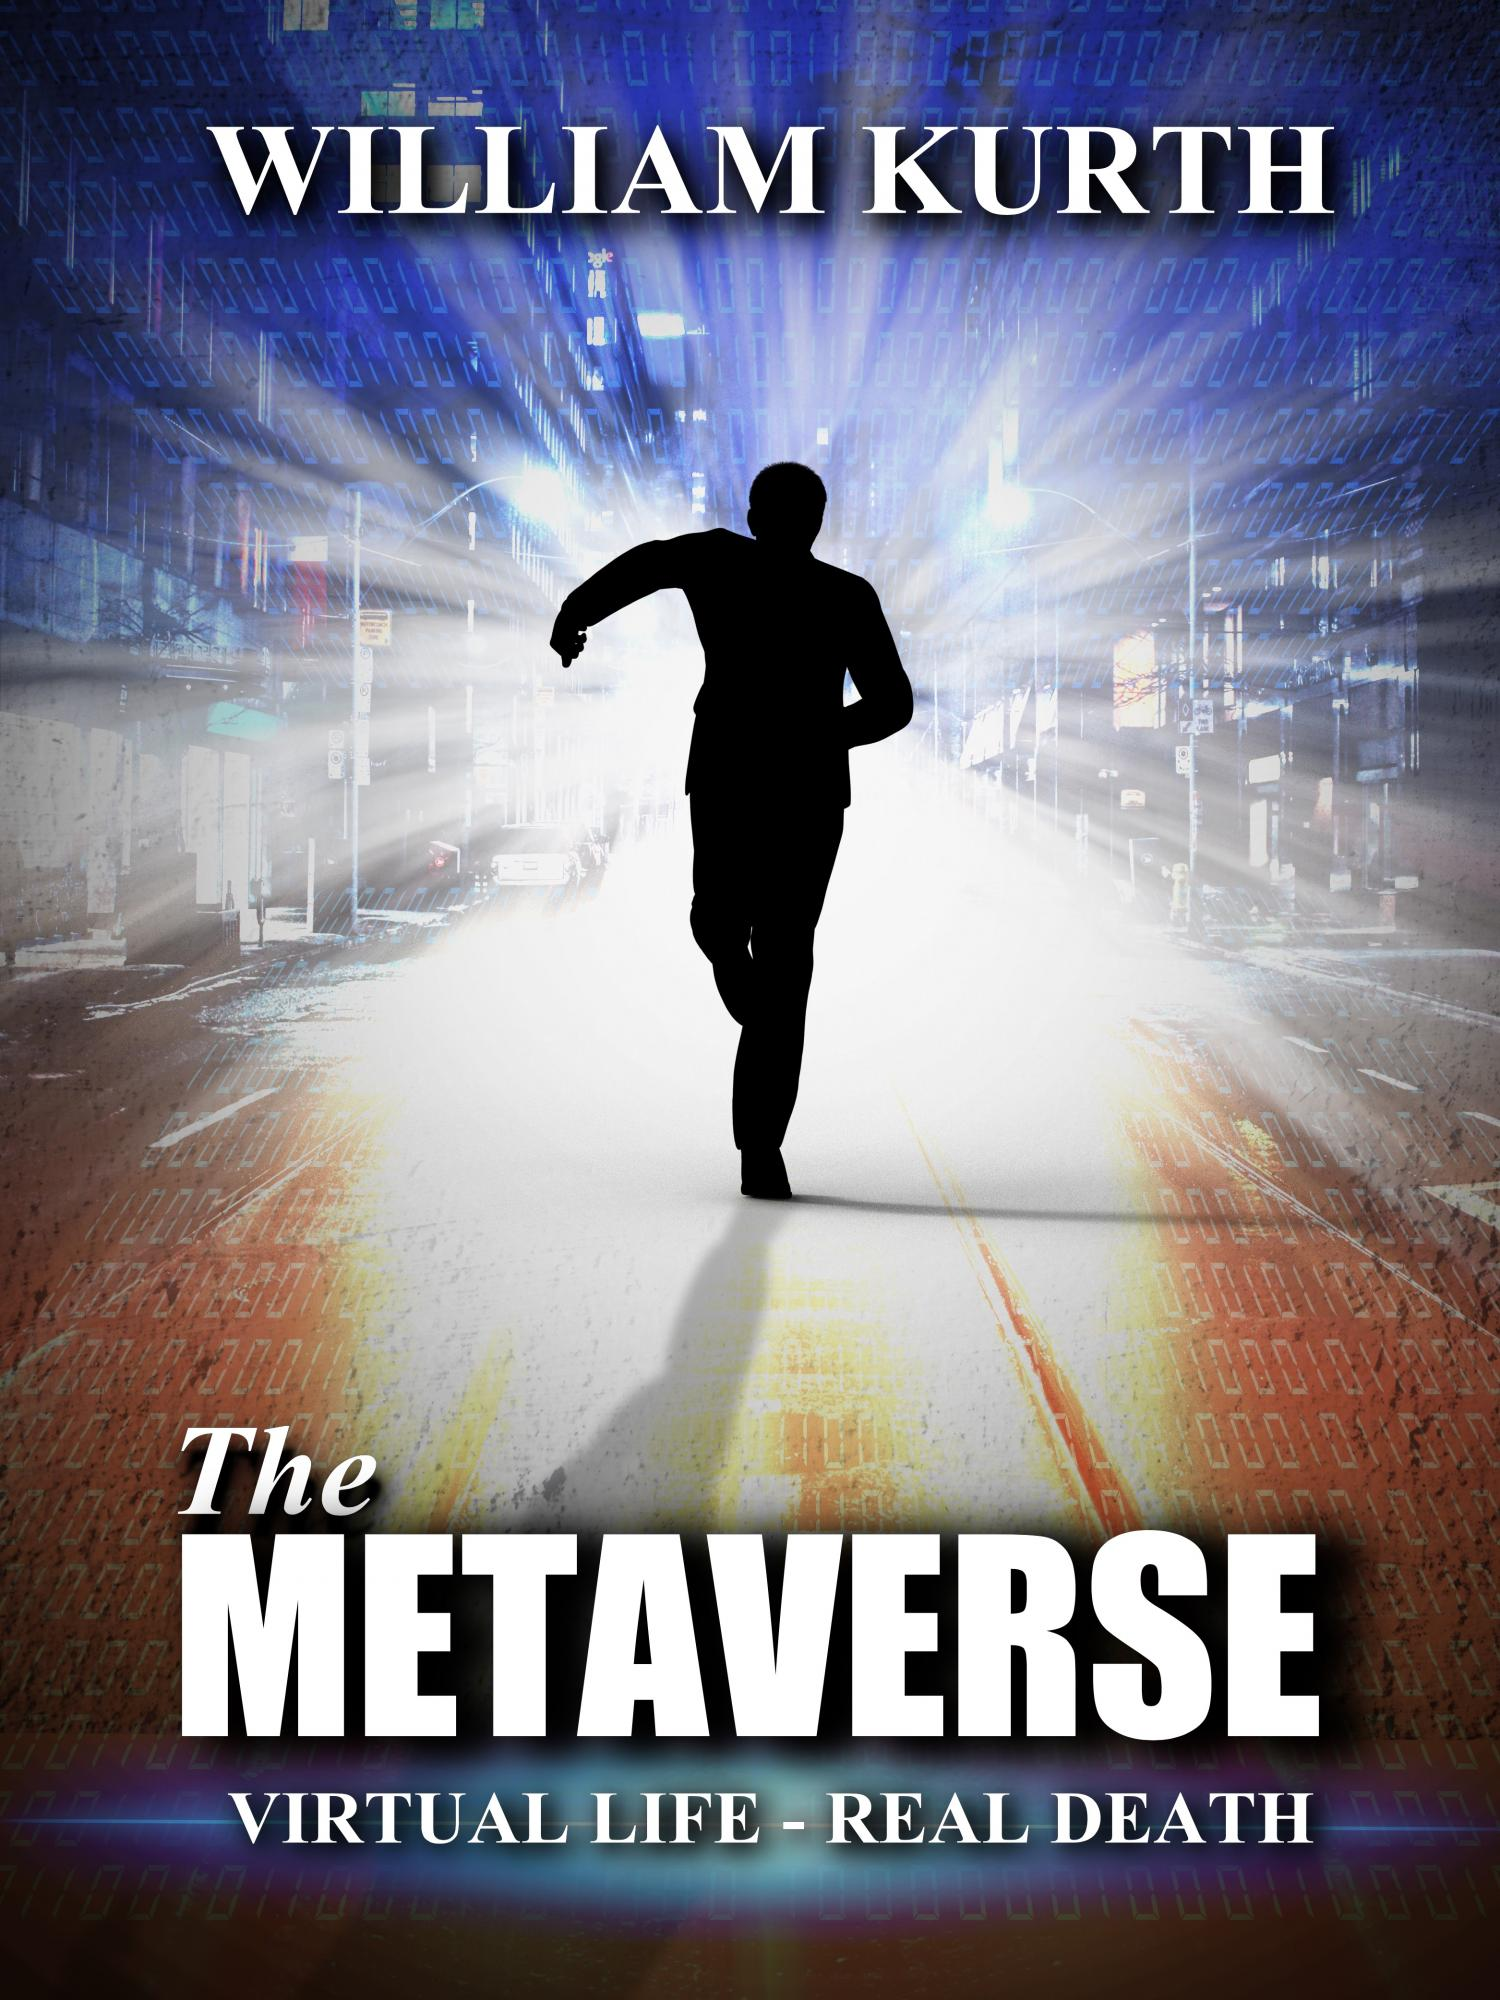 WillKurth-The Metaveers_72dpi-1500x2000-13